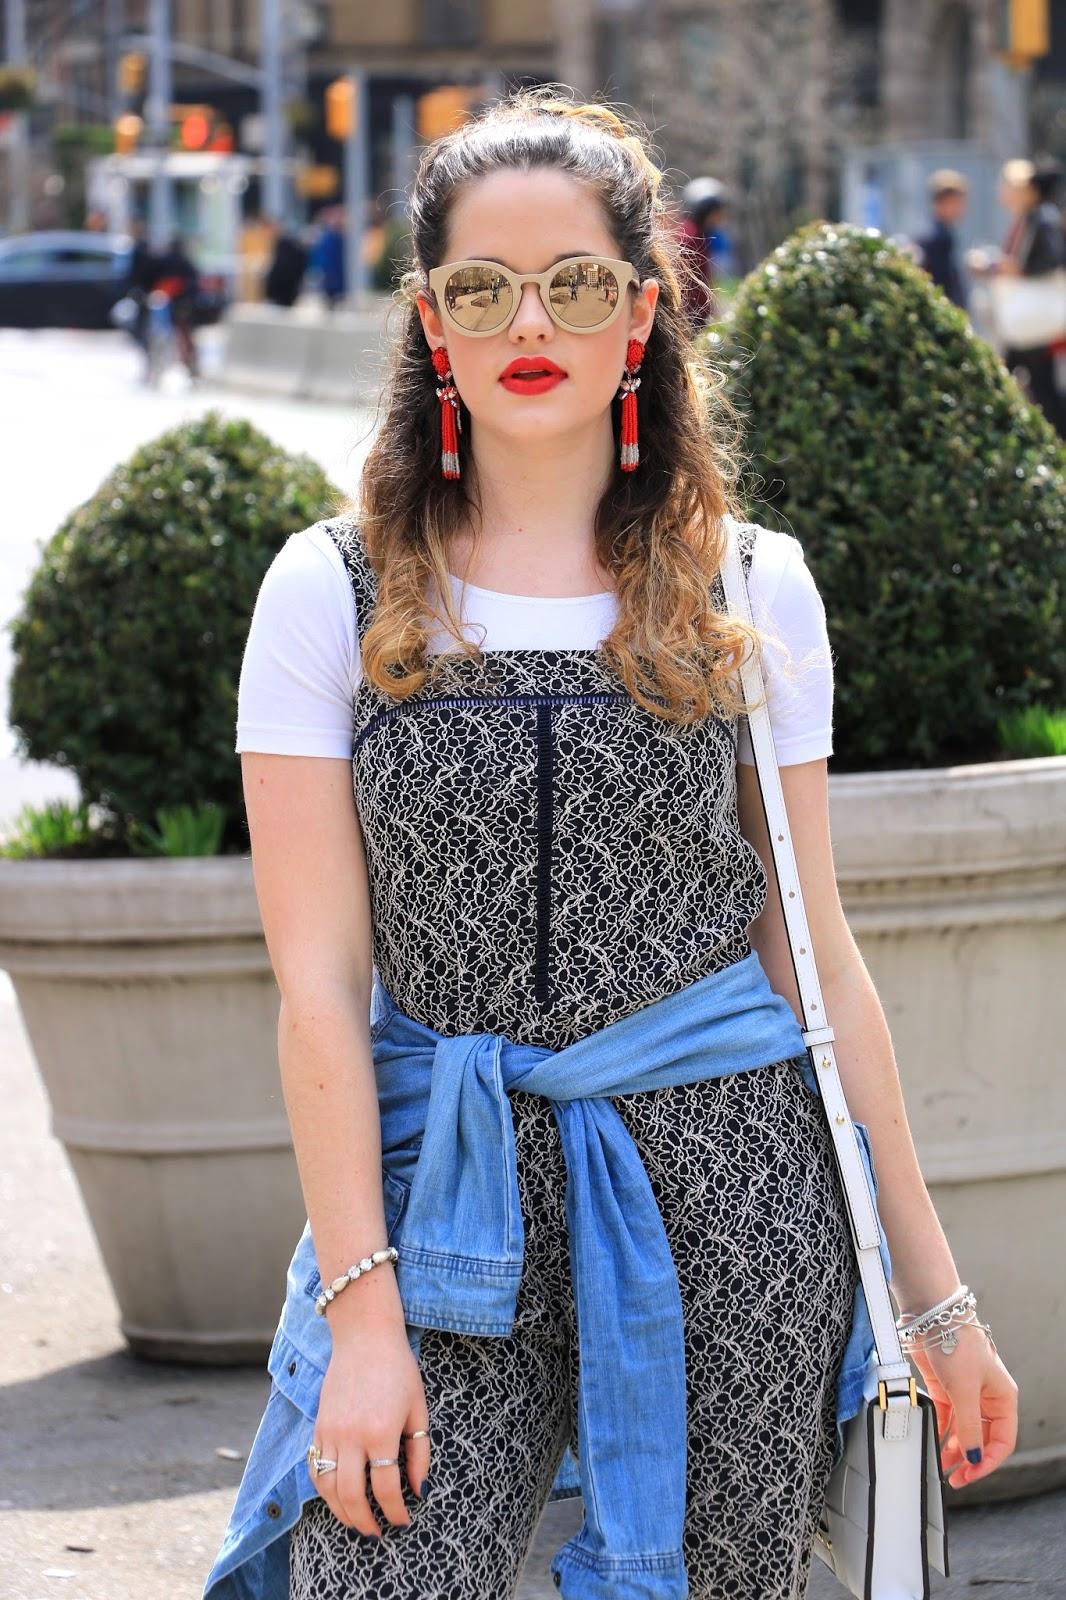 Nyc fashion blogger Kathleen Harper's spring trends